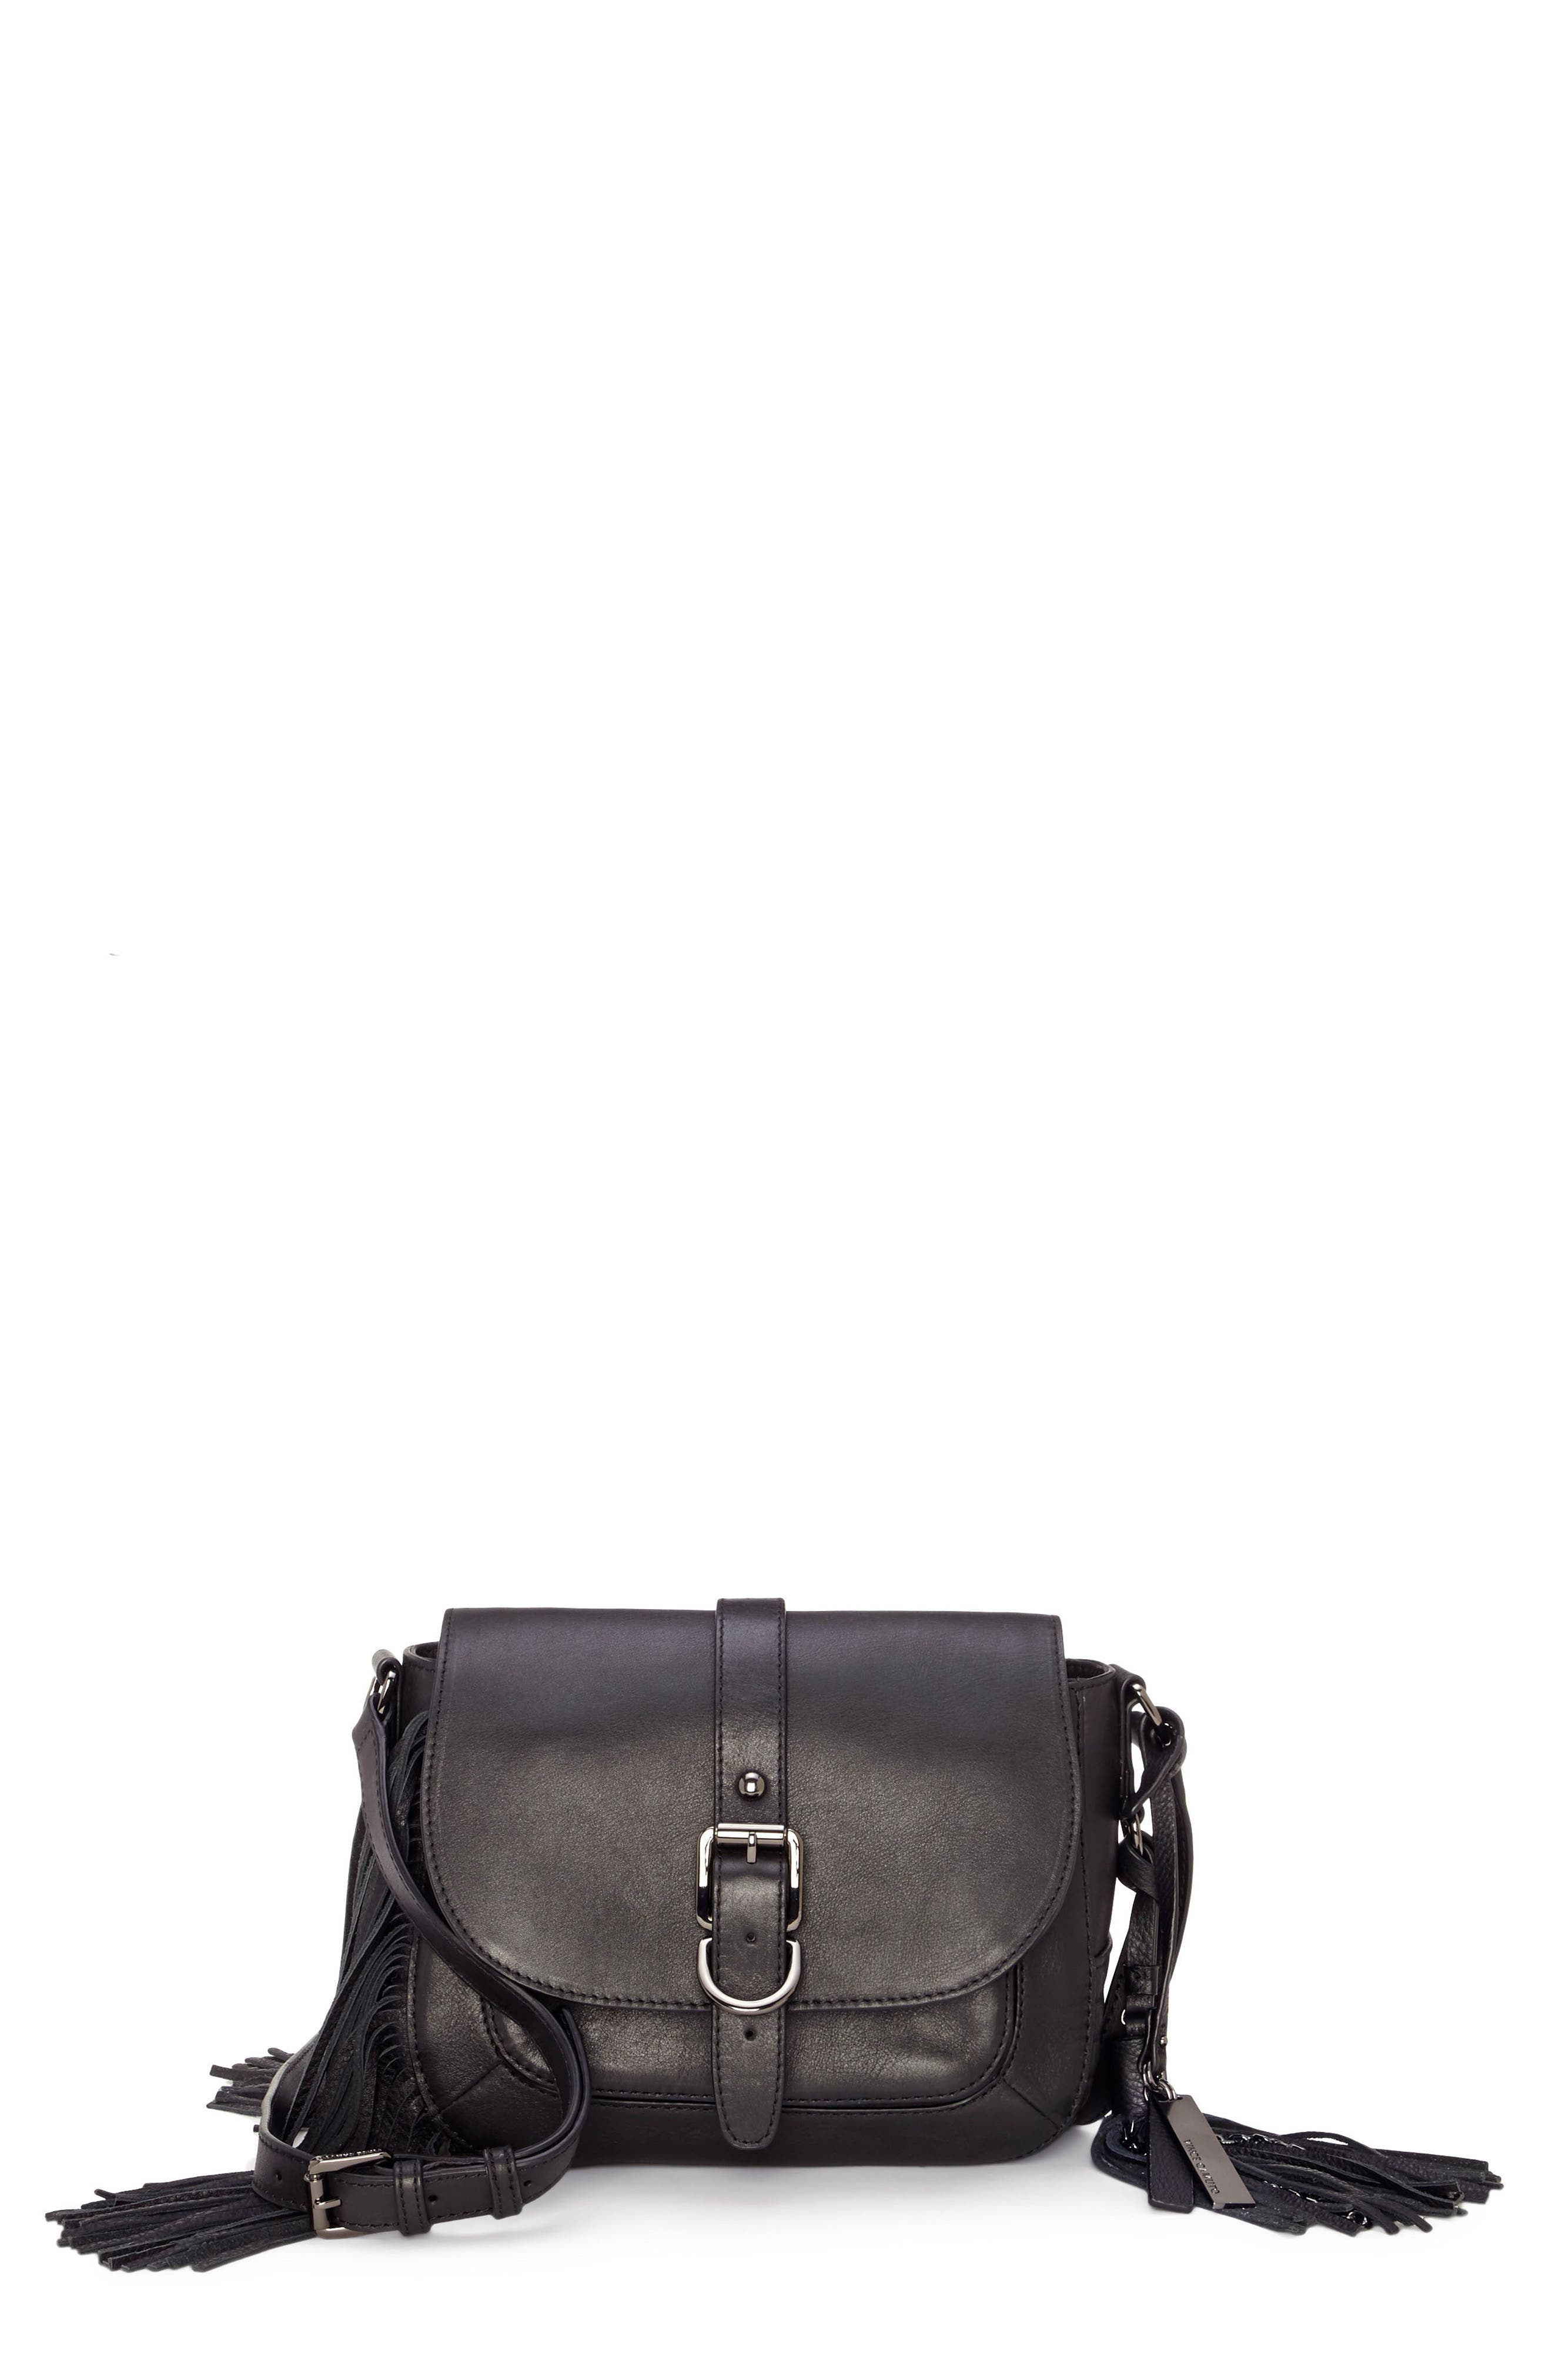 Hil Leather Crossbody Bag,                             Main thumbnail 1, color,                             002